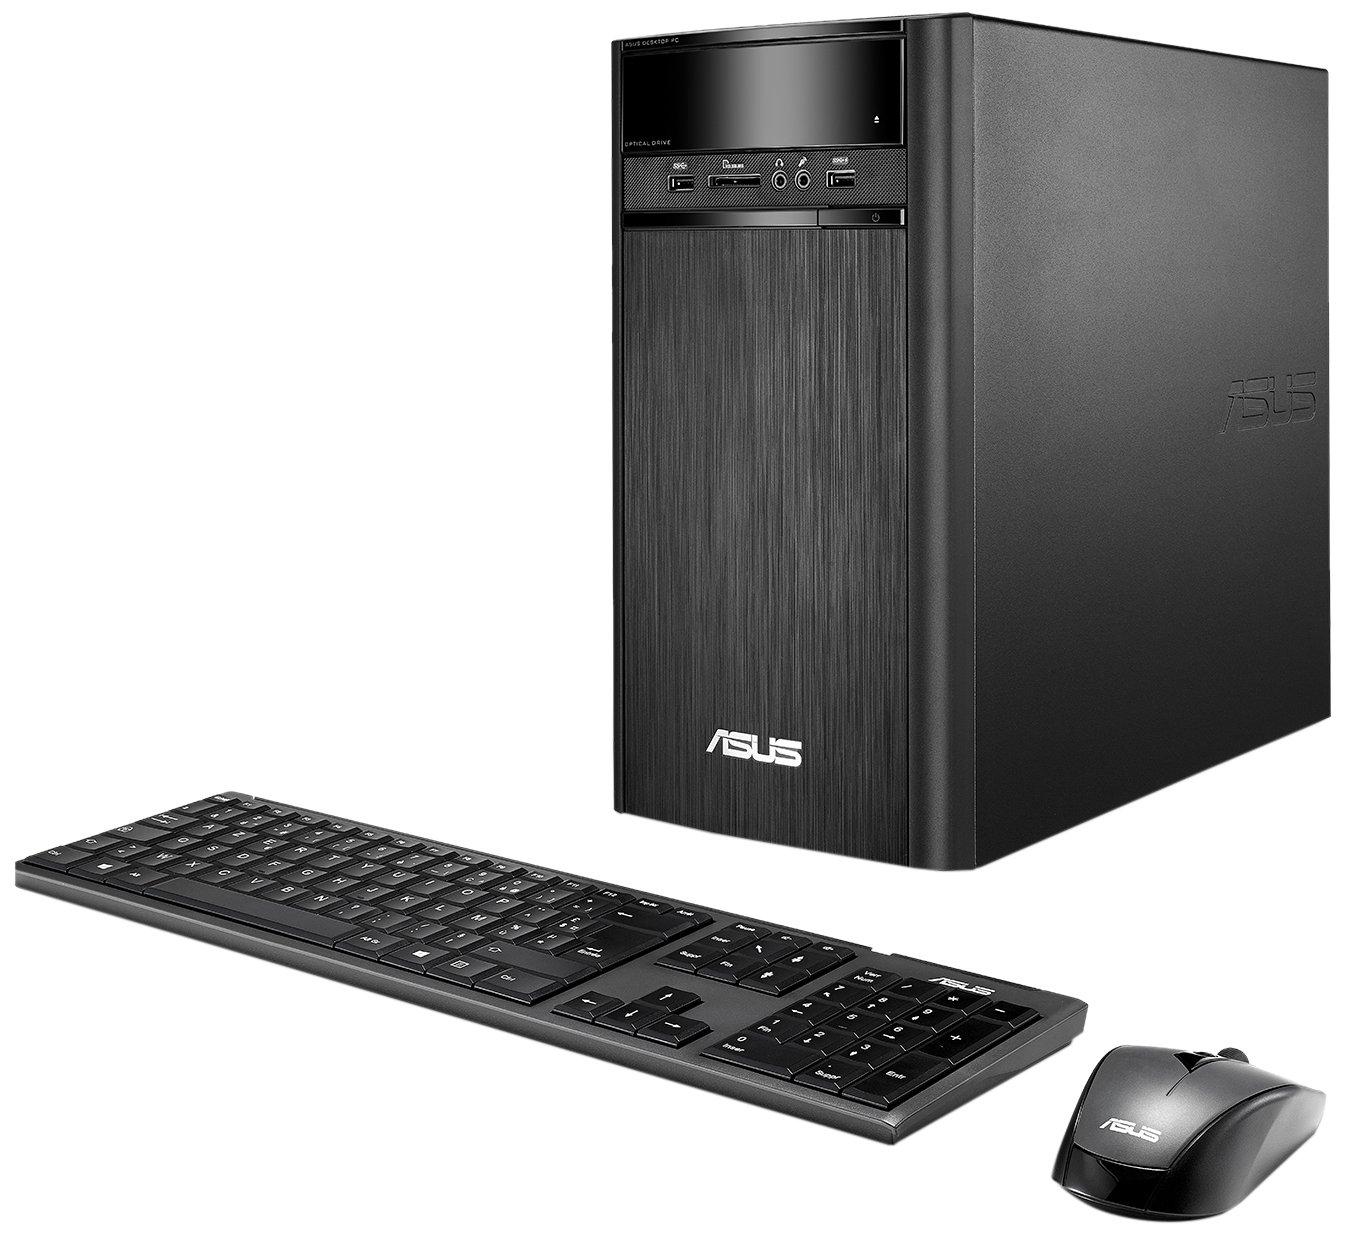 ASUS K31CD-DS71 VivoPC Desktop, Intel Core i7 3.6GHz Processor, 16GB DDR4, 2TB 7200RPM HDD, Windows 10 Home